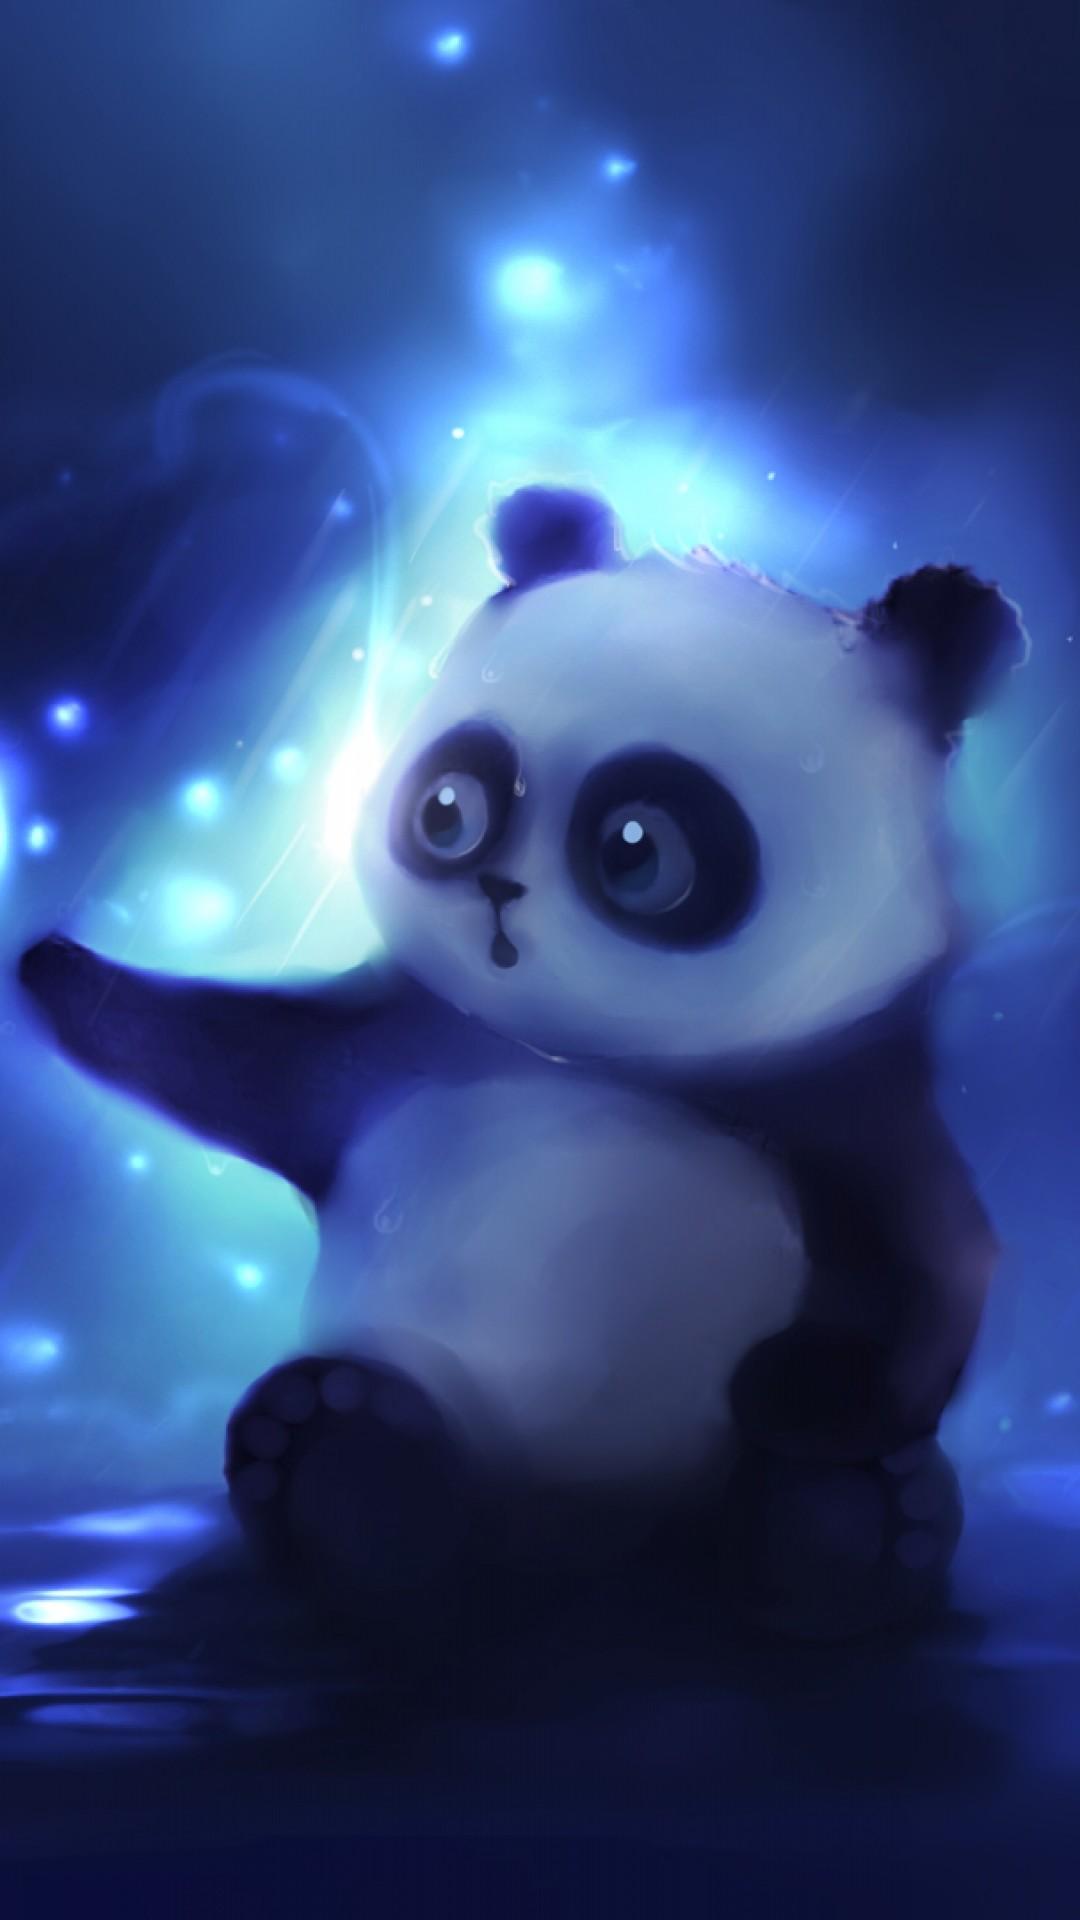 Preview wallpaper panda, art, apofiss, night 1080×1920